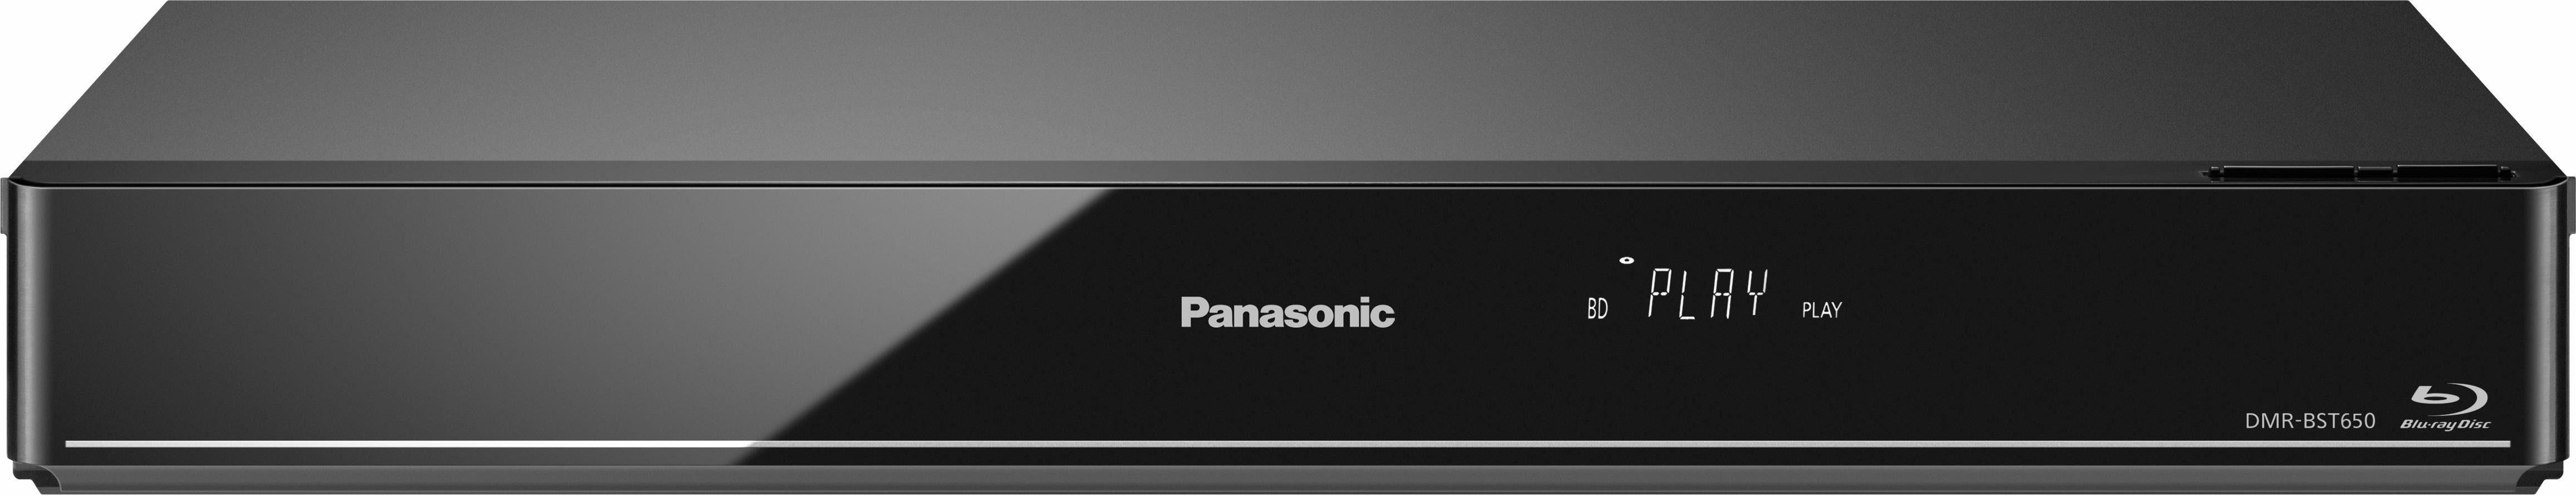 Panasonic DMR-BST650 Blu-ray-Recorder, 3D-fähig, 1080p (Full HD), 500 GB